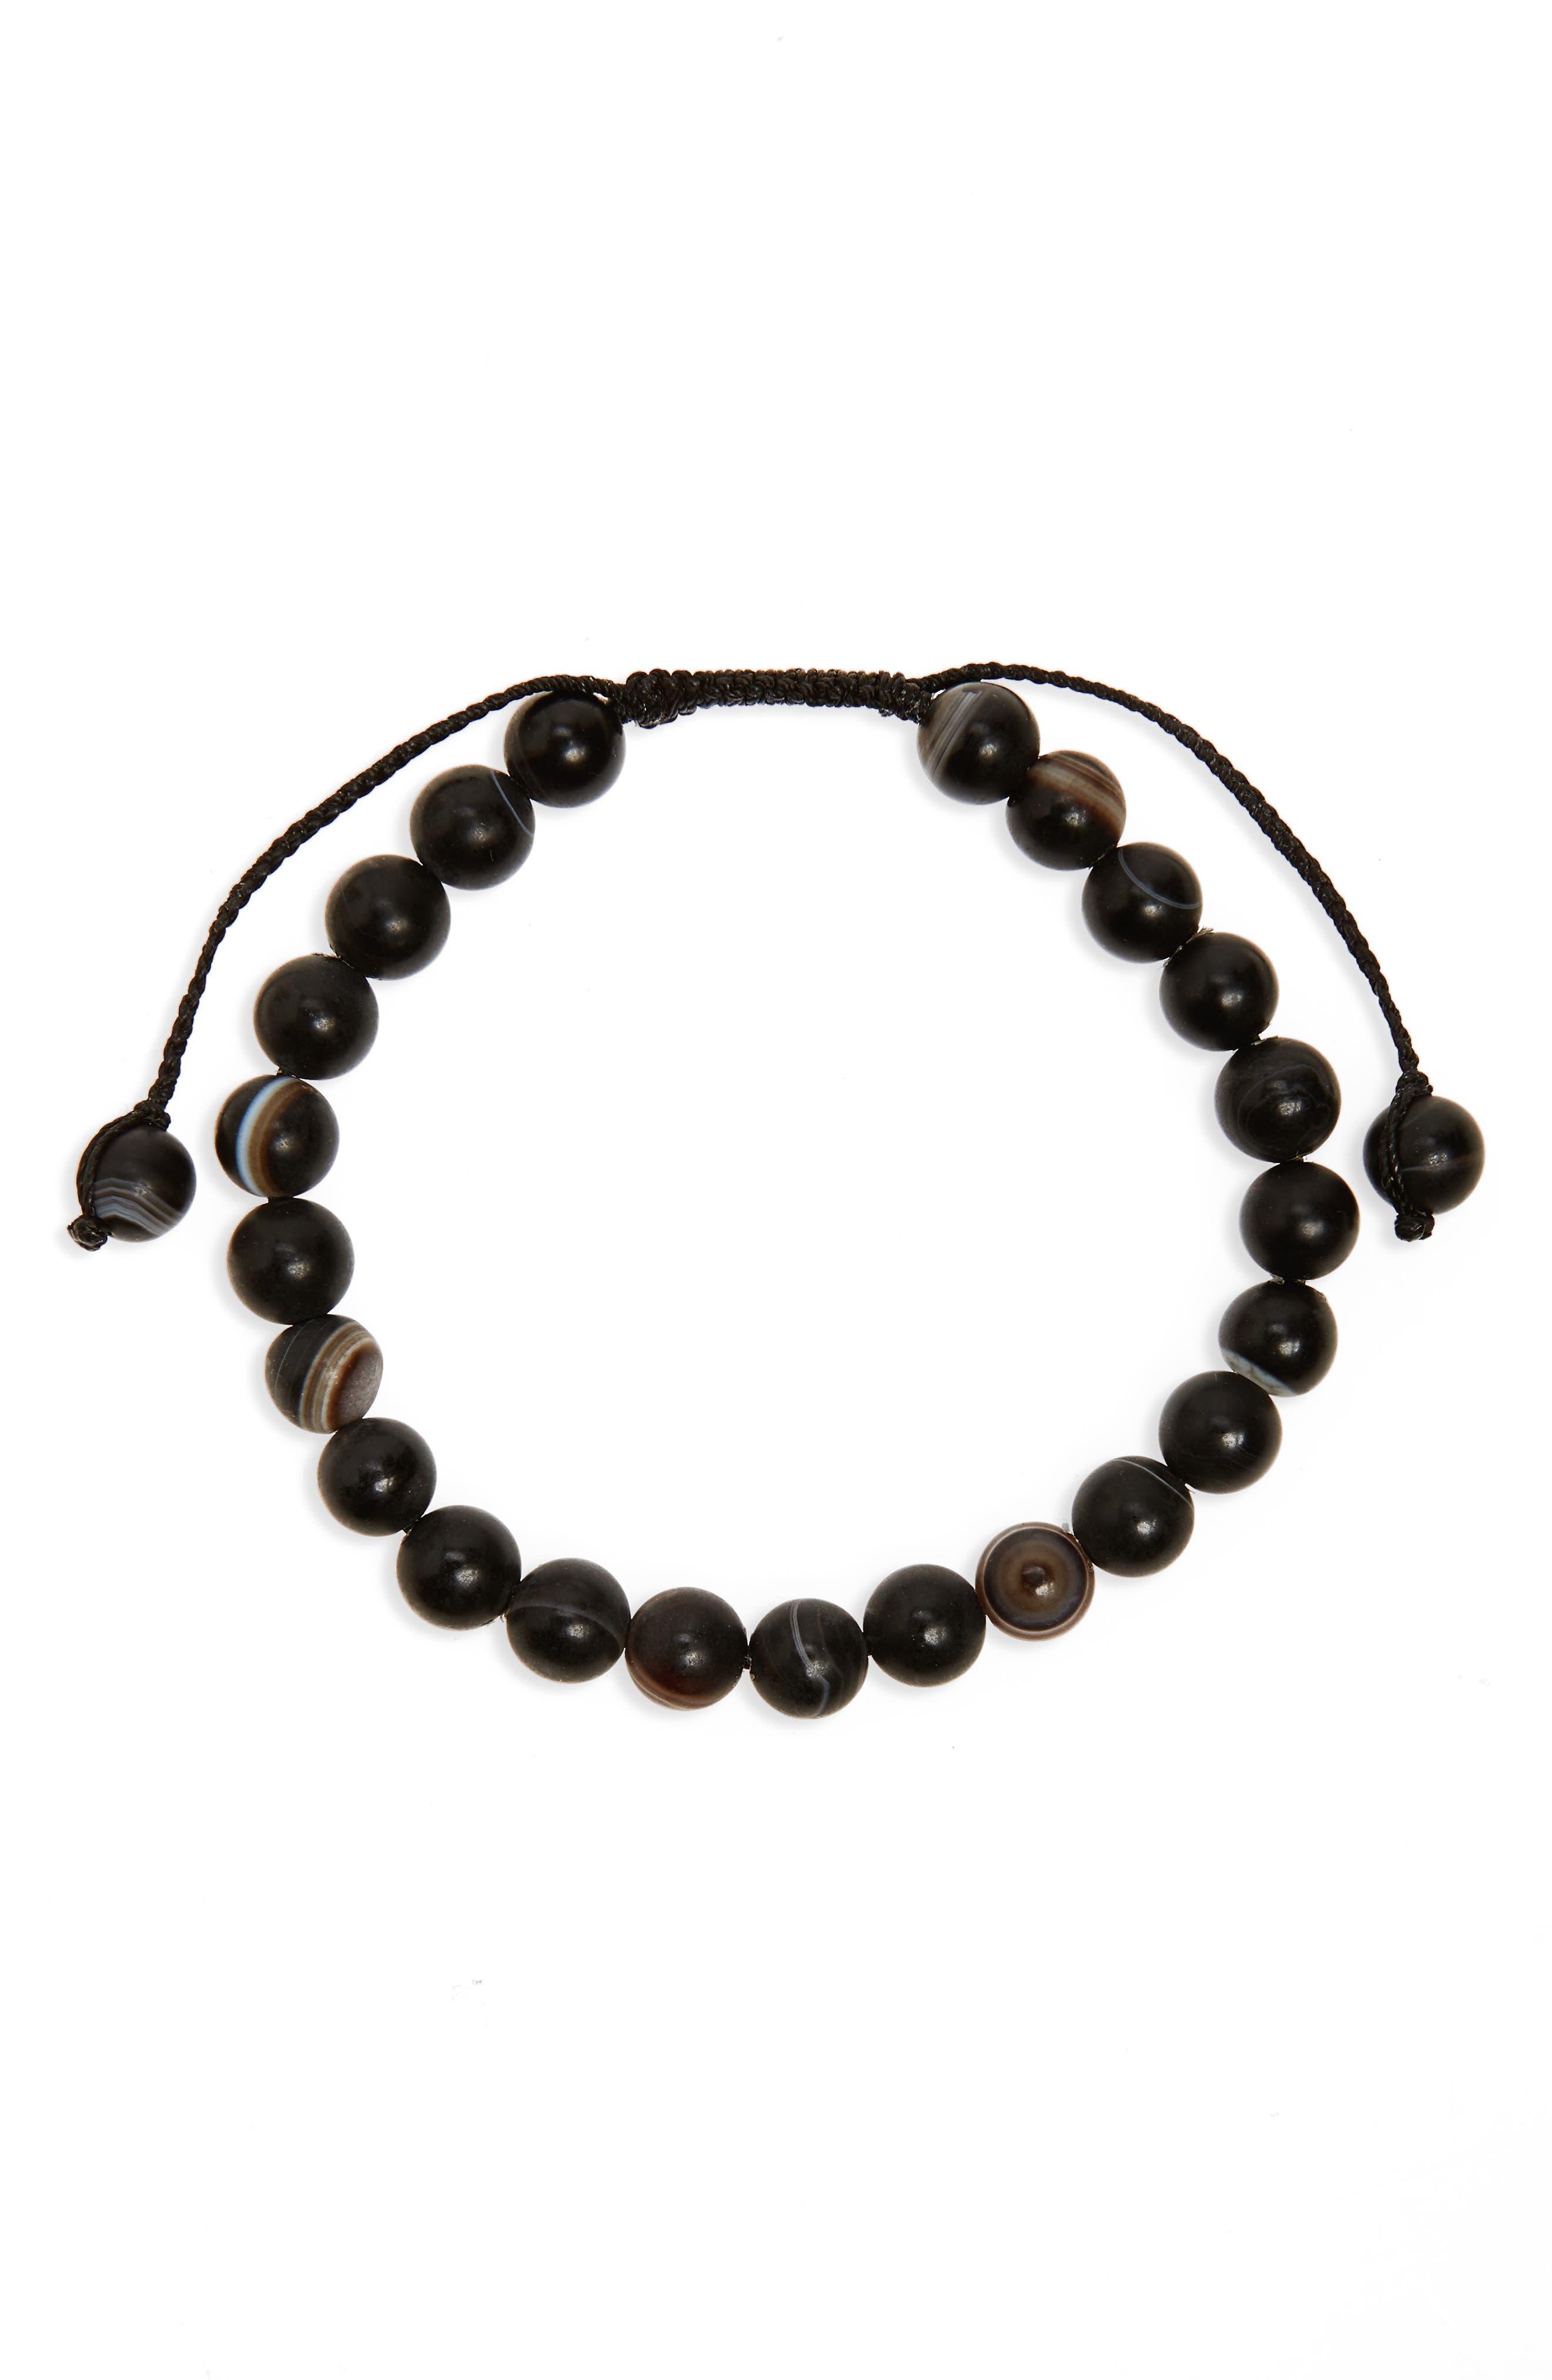 Agate Bead Bracelet,                             Main thumbnail 1, color,                             Black